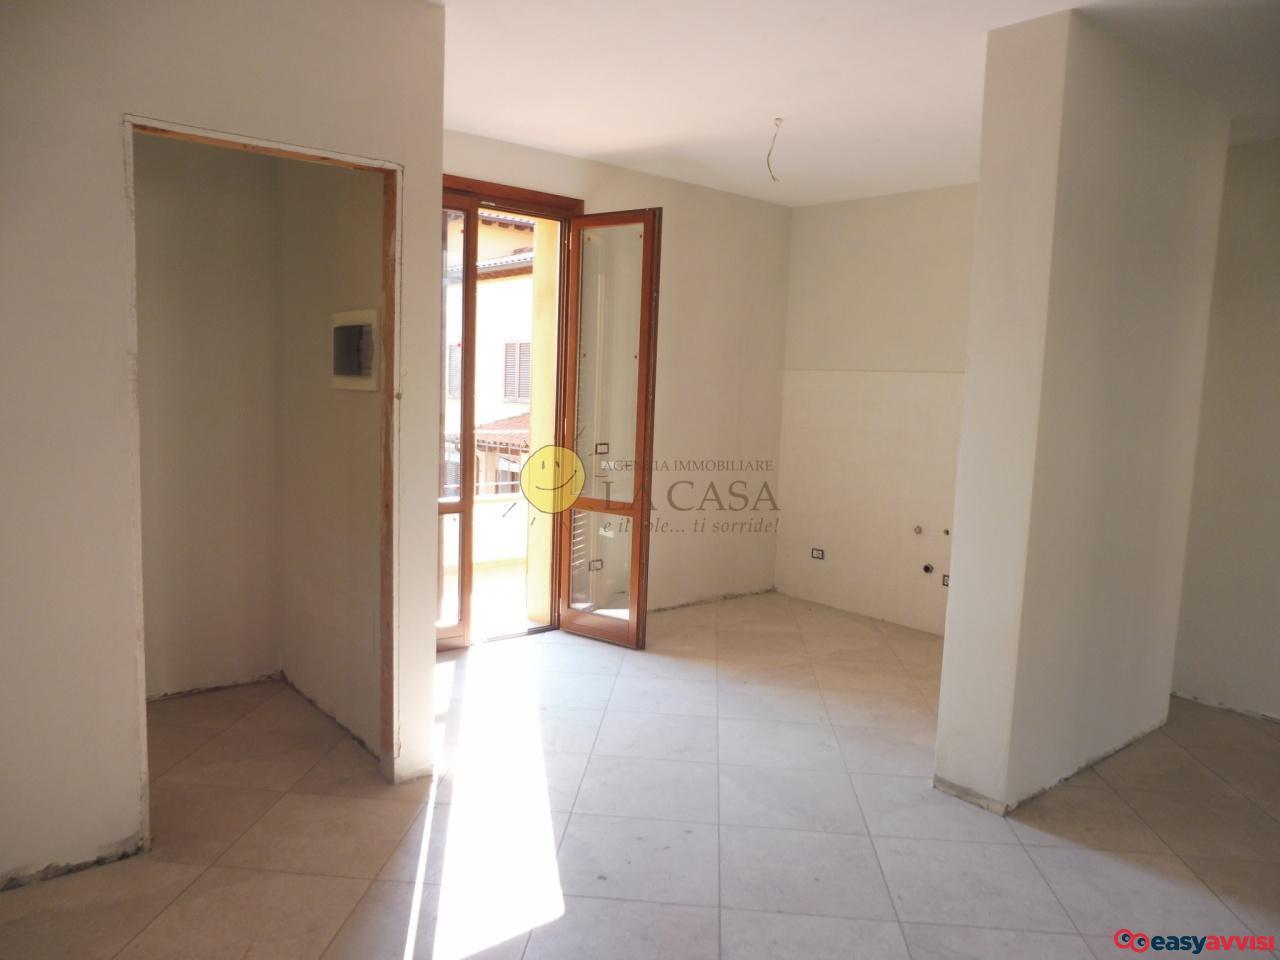 Appartamento 5 vani 112 mq, citta metropolitana di firenze